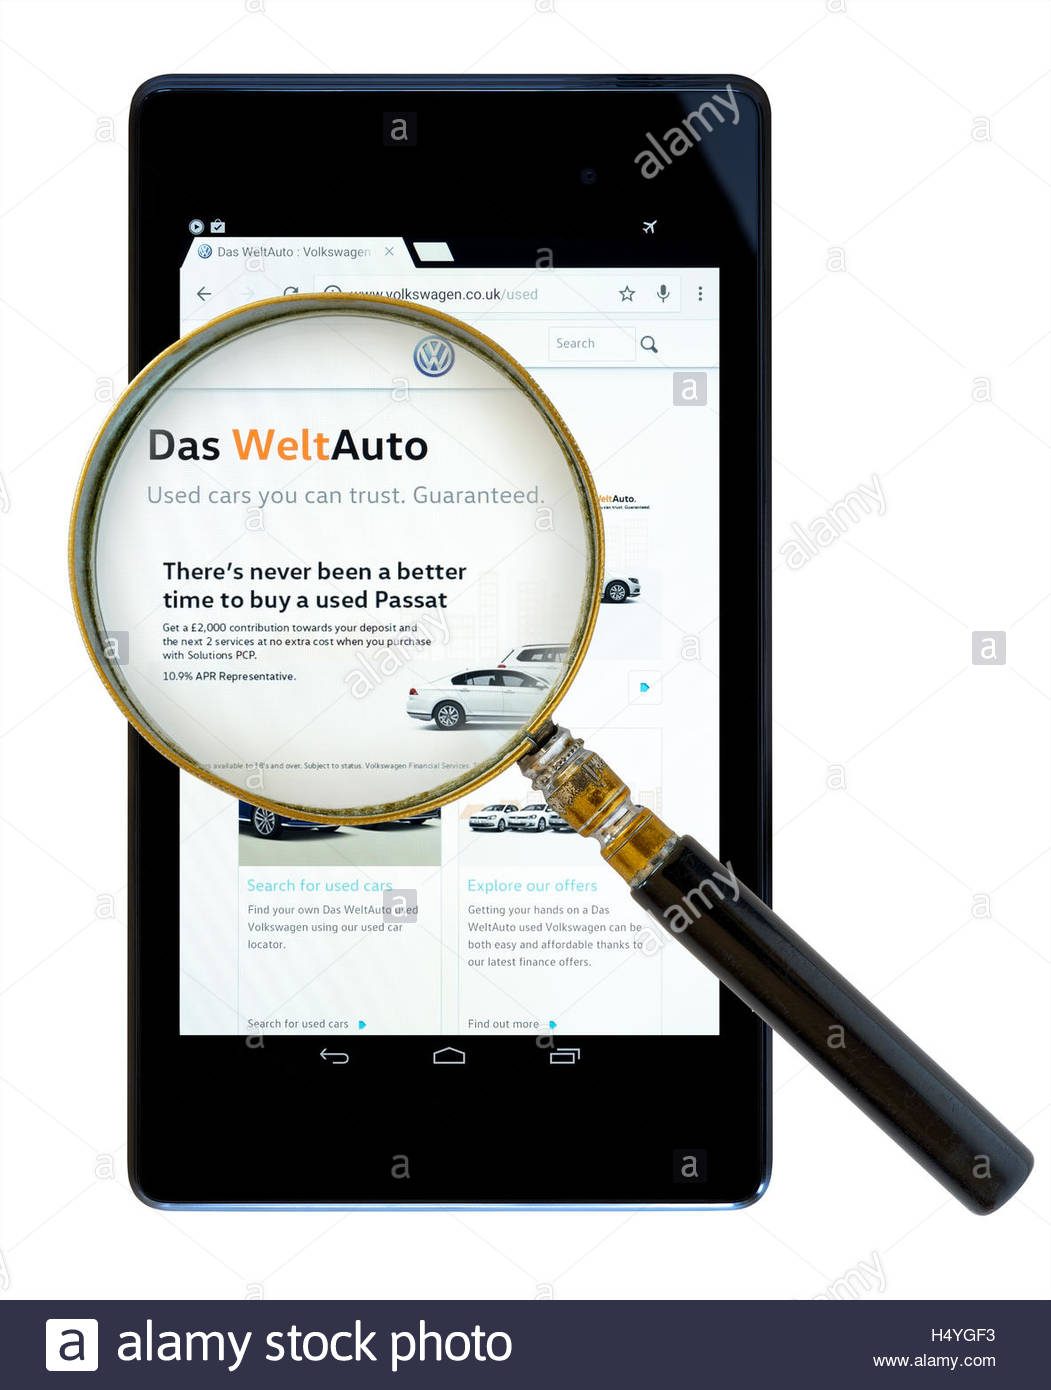 Das WeltAuto websiteshown on a tablet computer, Dorset, England, UK Stock Photo